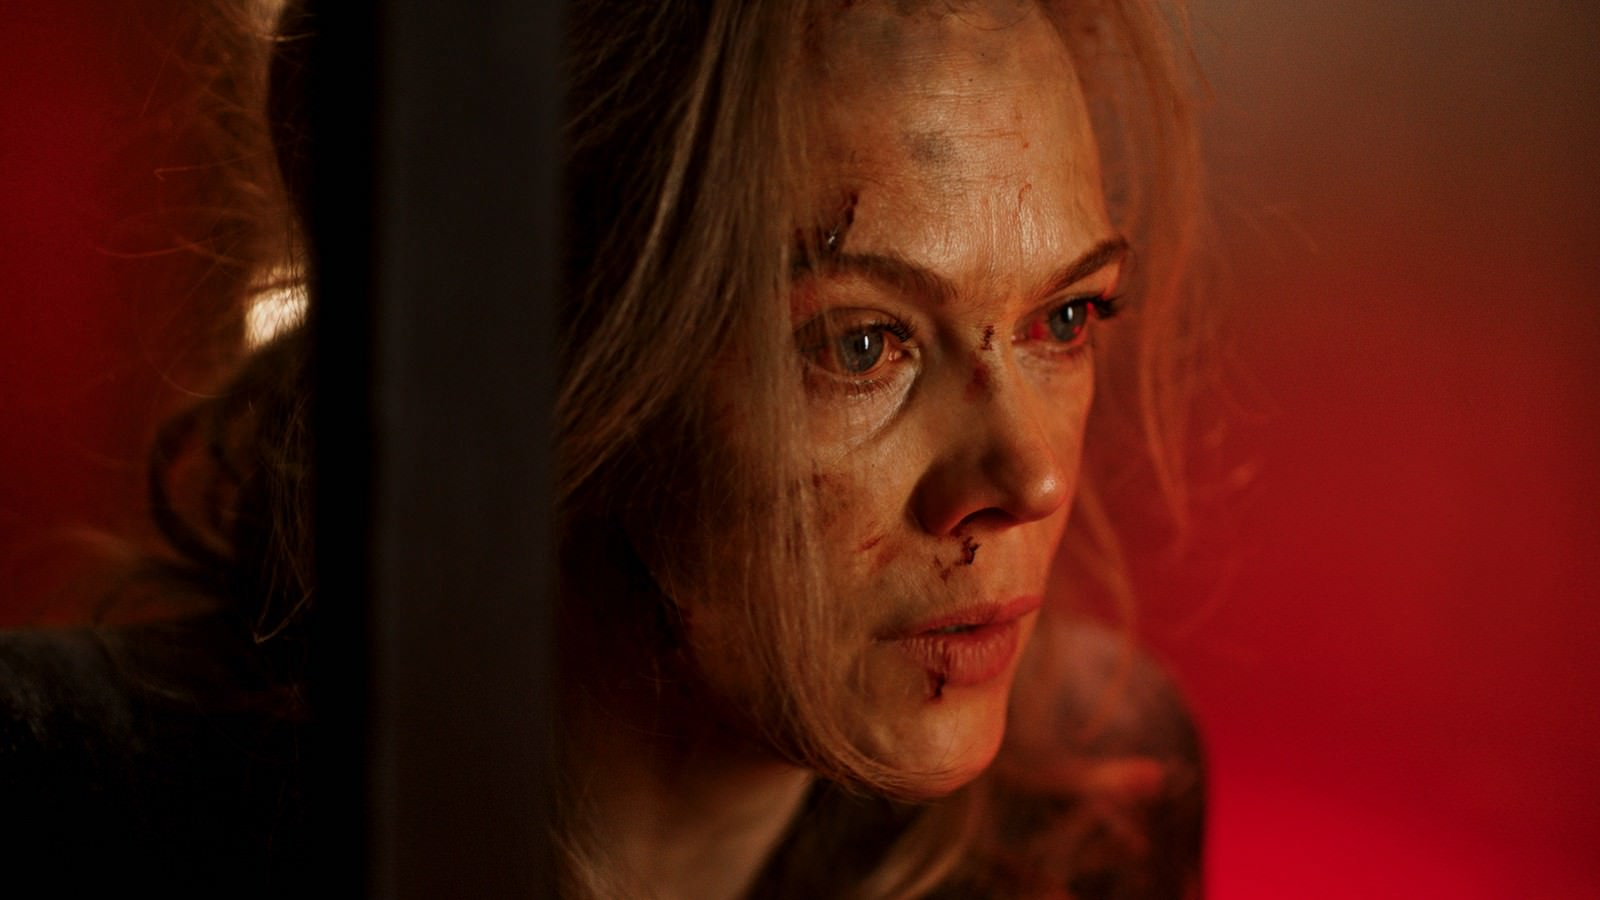 Movie, Skjelvet(挪威, 2018年) / 芮氏9.6(台灣) / 八級大地震:命懸一劫(香港) / The Quake(英文), 電影角色與演員介紹